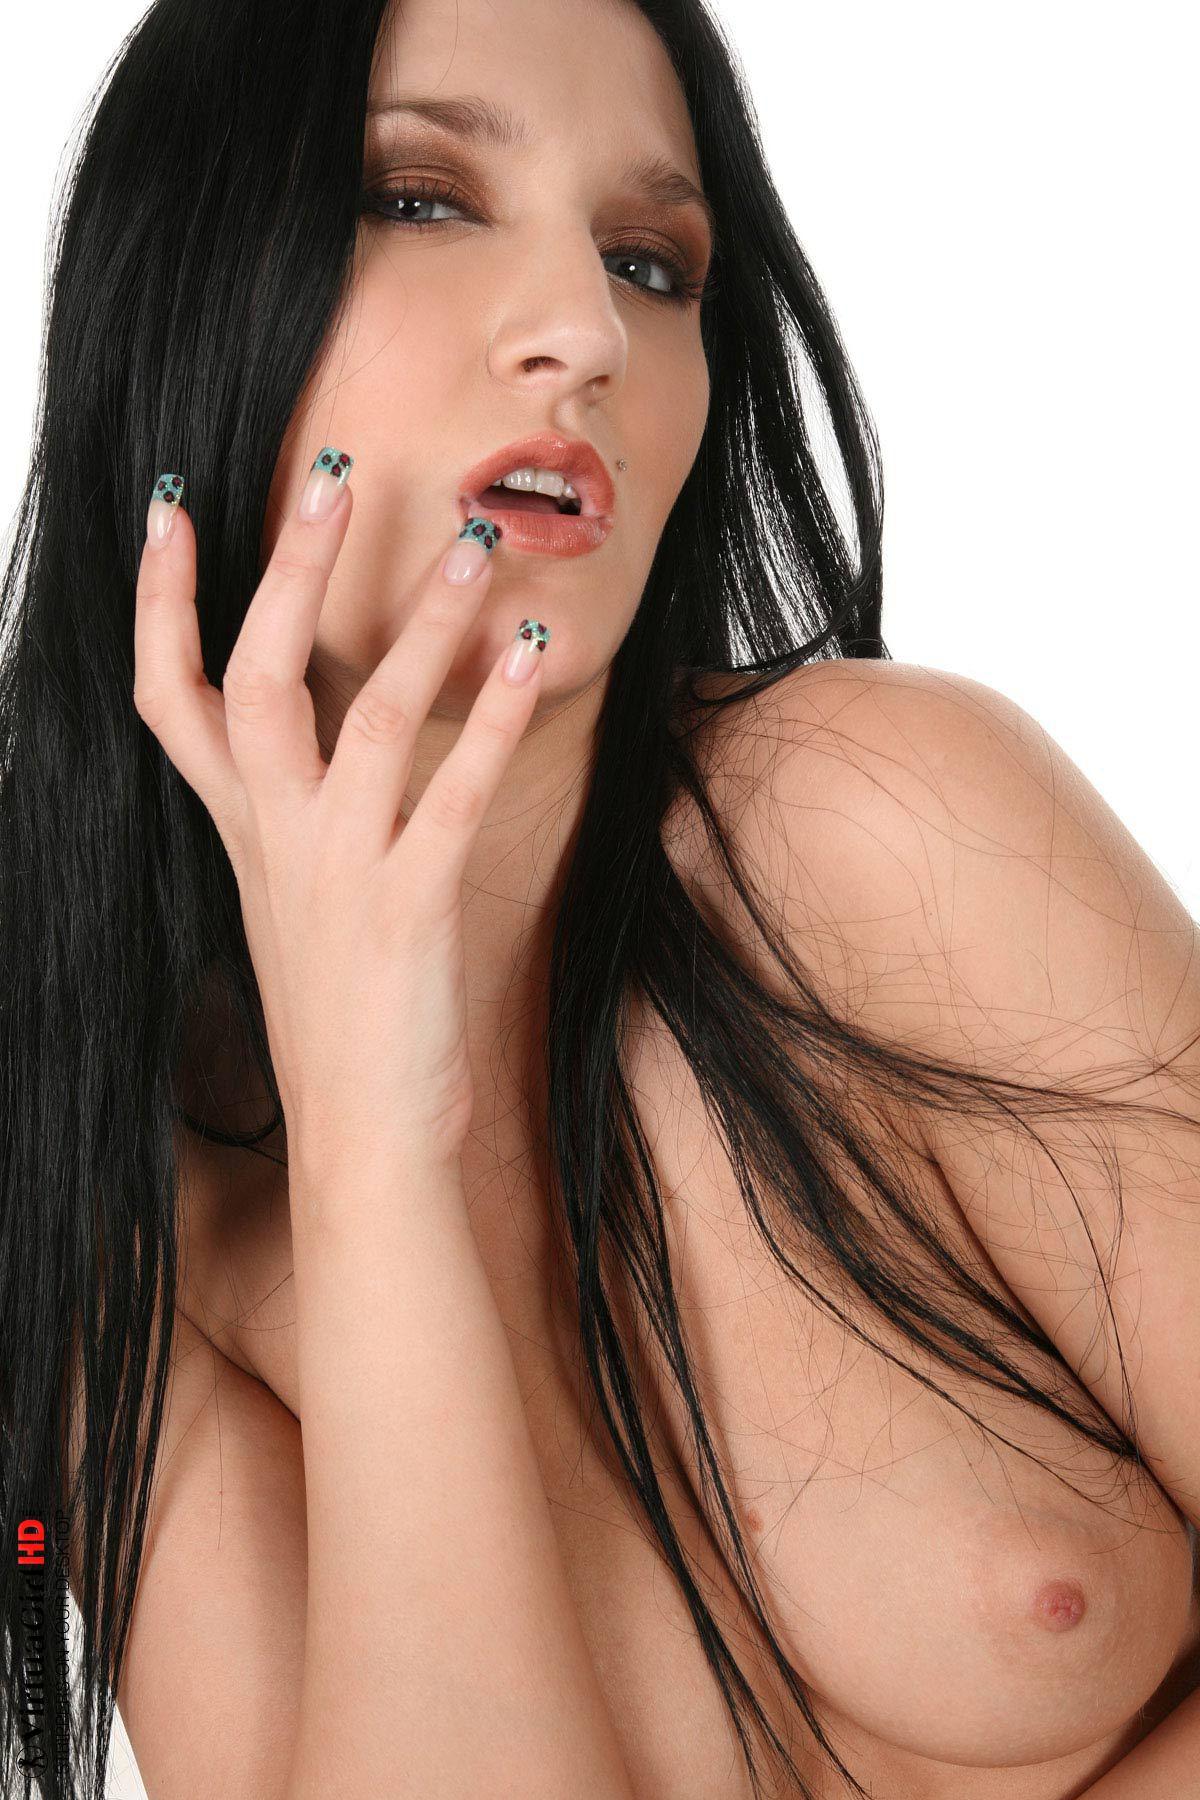 girls stripping naked in walmart